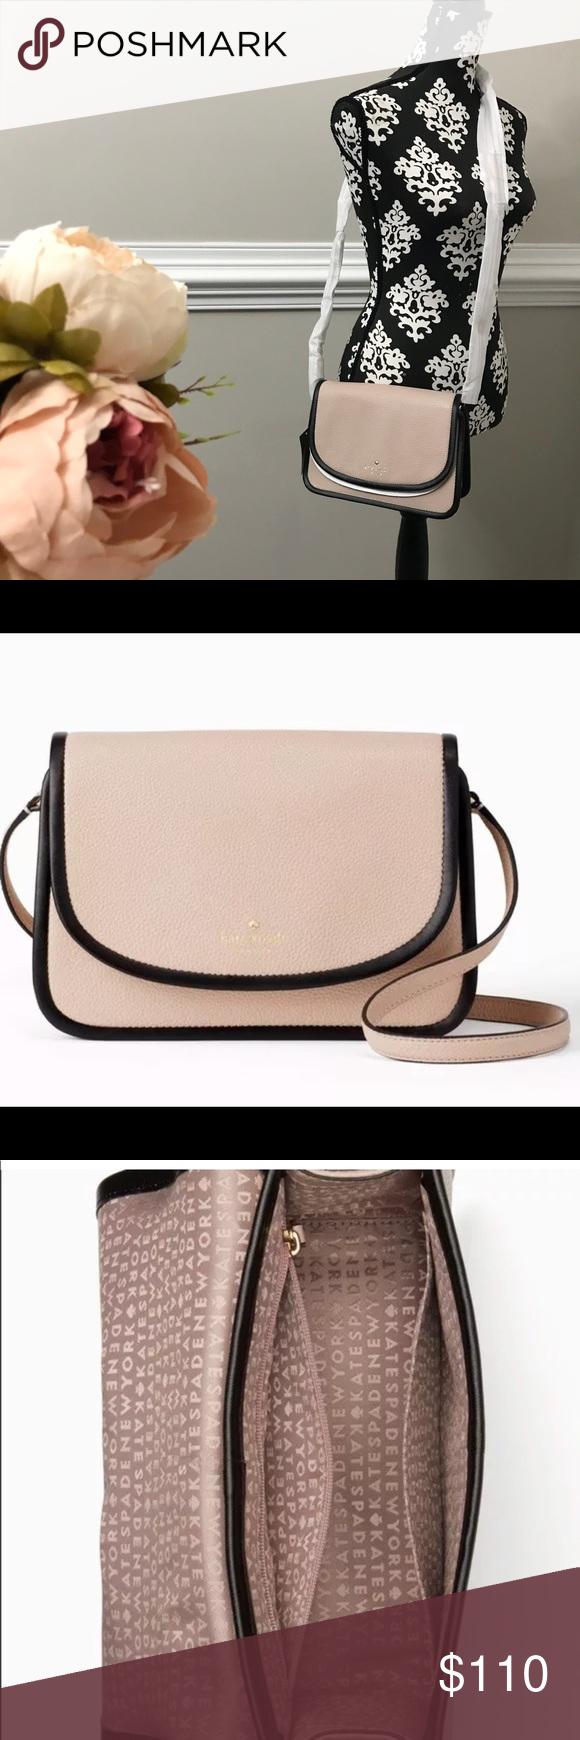 58f1256cffe51 Kate Spade Ivy Ward Place Leather Handbag Width  9.5